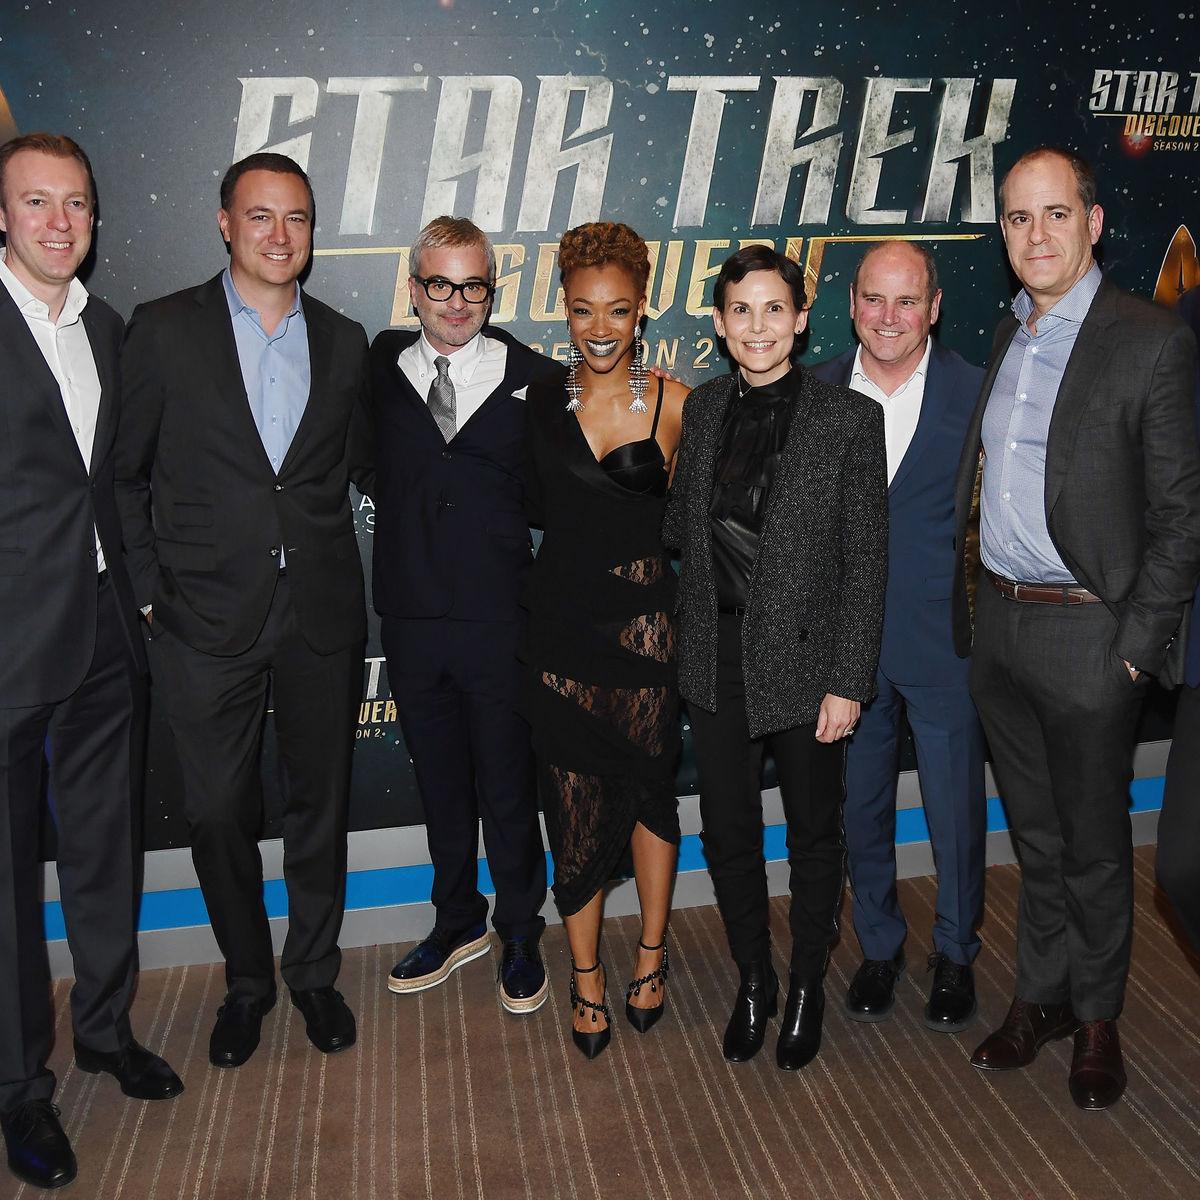 Star Trek Discovery red carpet getty